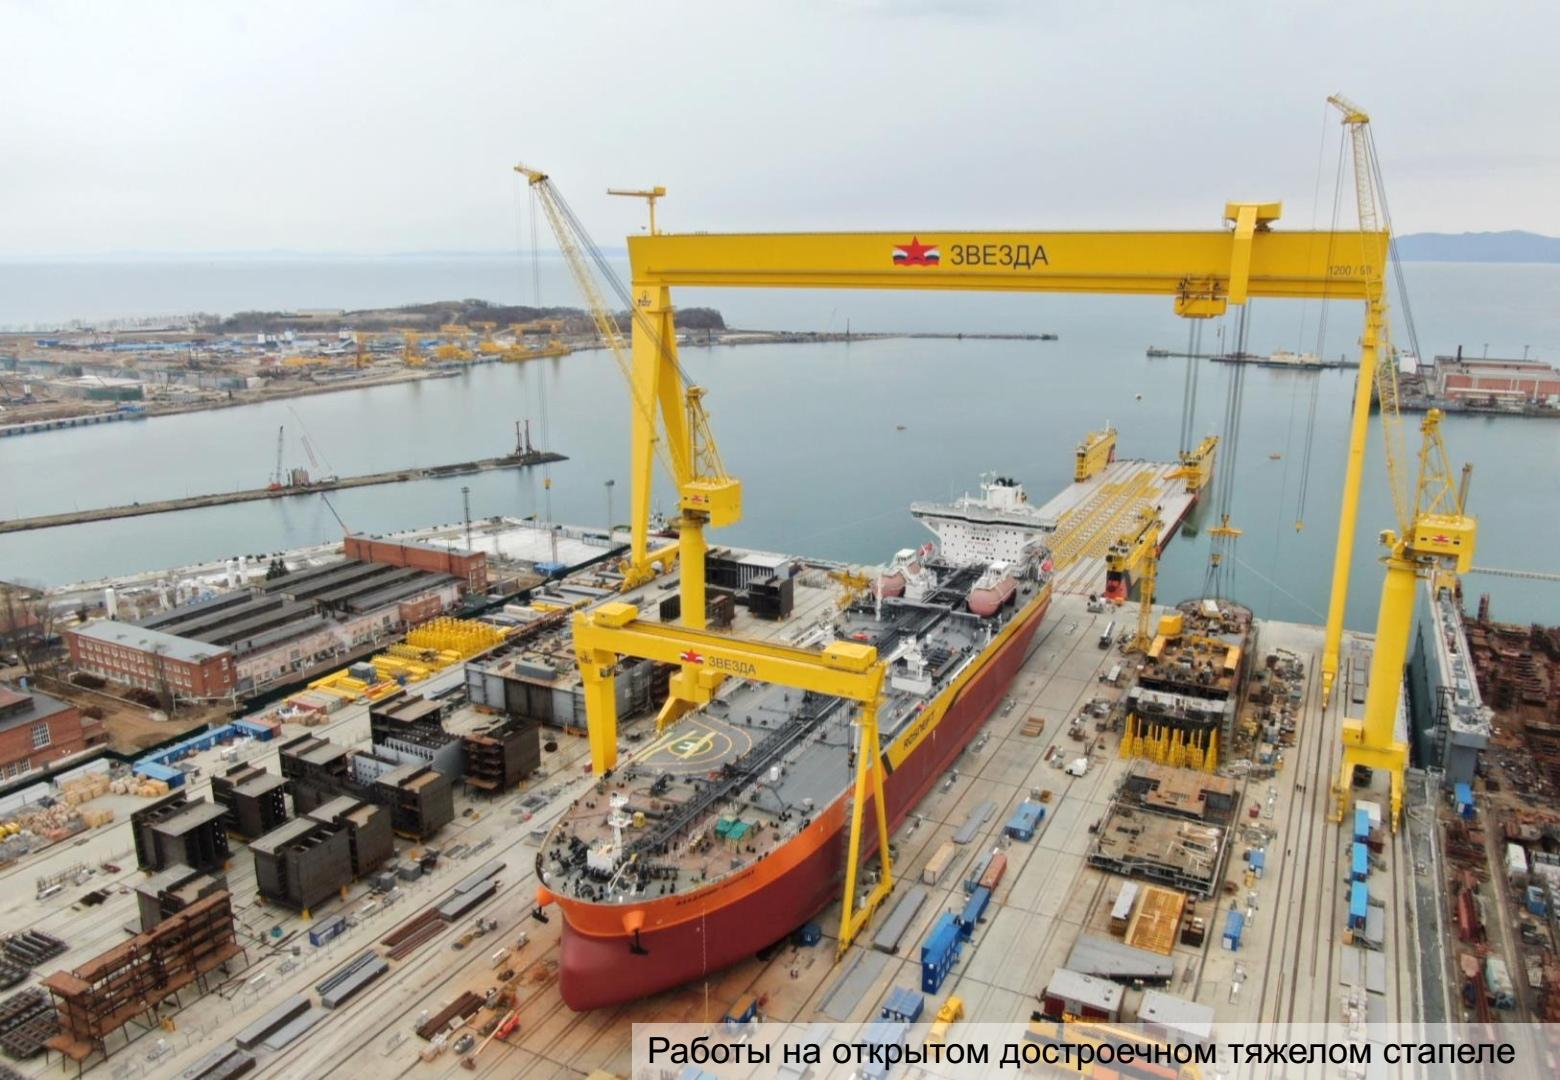 Russian Naval Shipbuilding Industry: News - Page 26 Aqp0I9XSti8